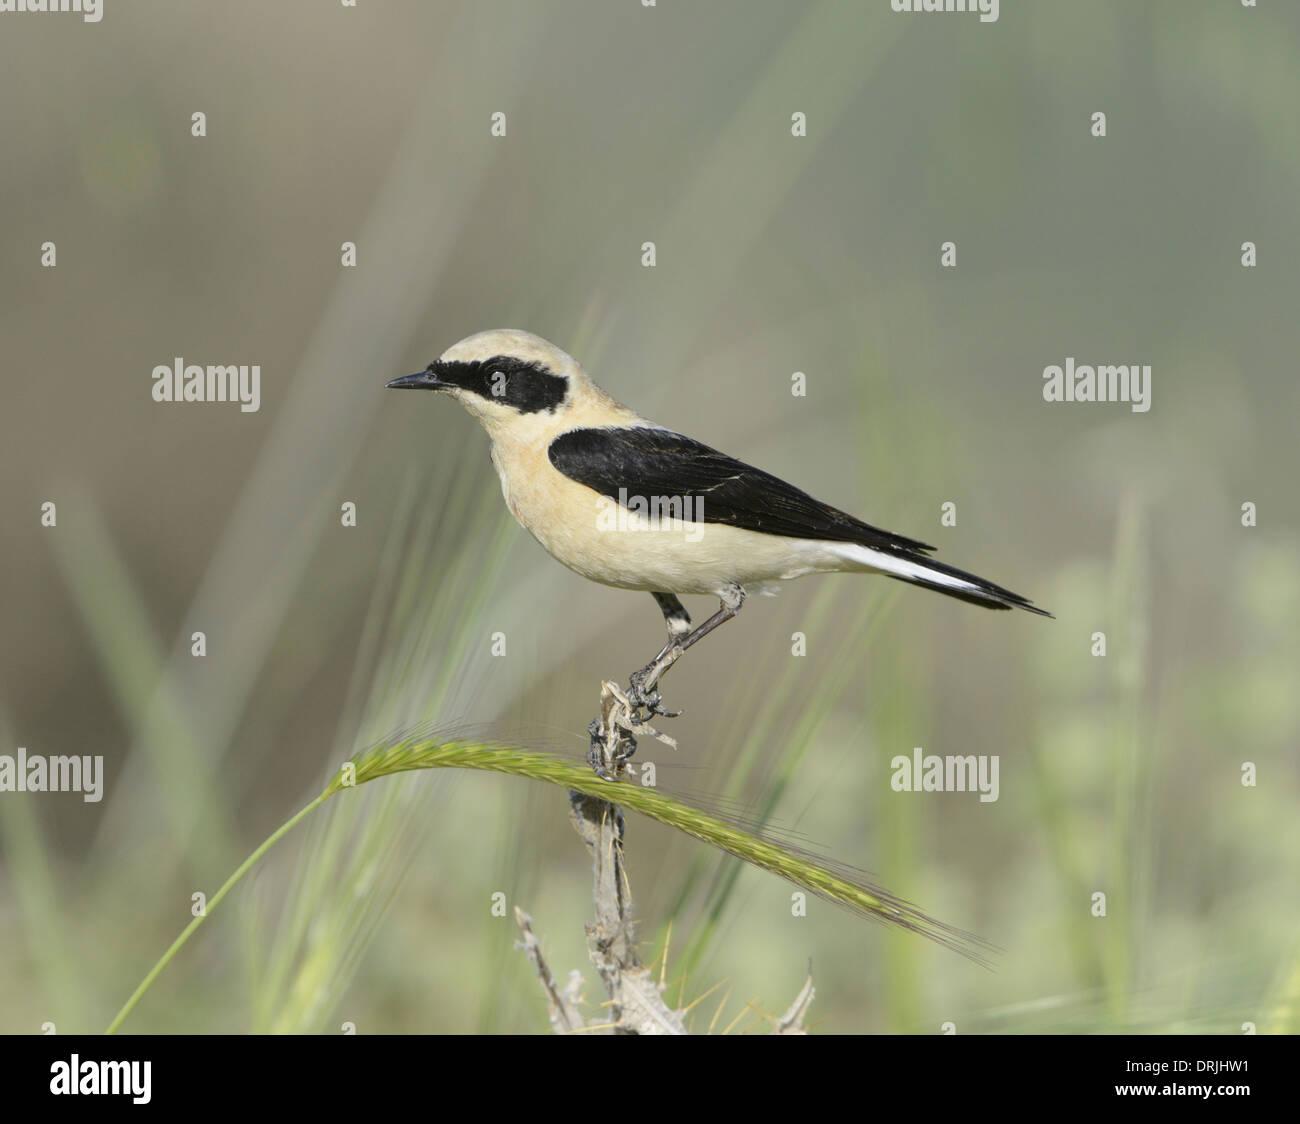 Nero-eared culbianco - Oenanthe hispanica - gara orientale maschio, pale-throated forma Immagini Stock